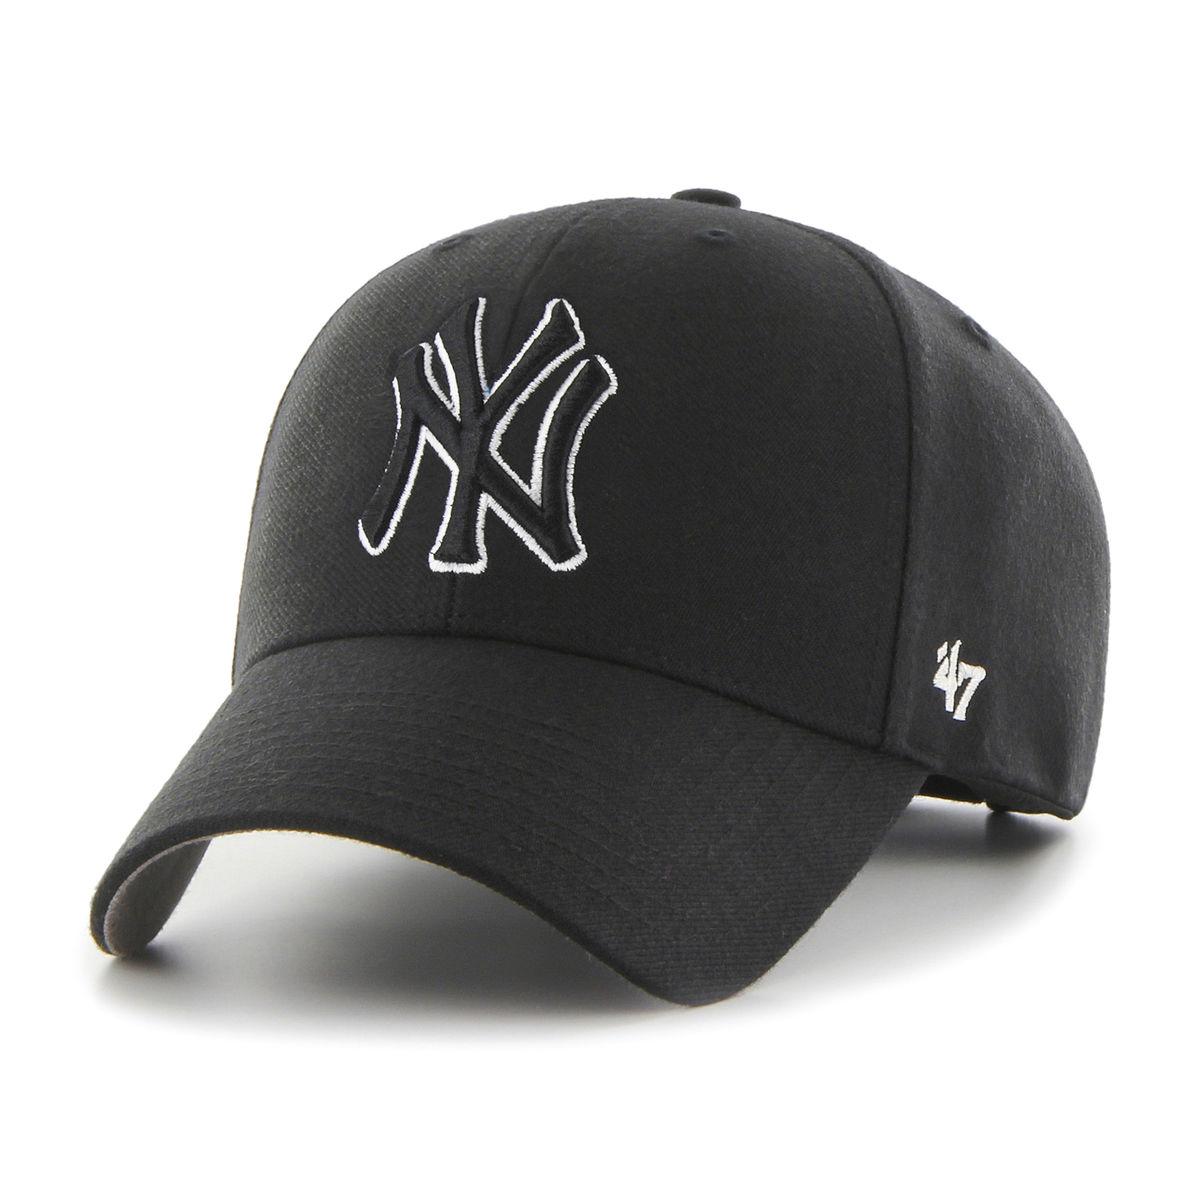 47 BRAND CZAPKA NEW YORK YANKEES MVP CZARNA (B-MVPSP17WBP-BKC)